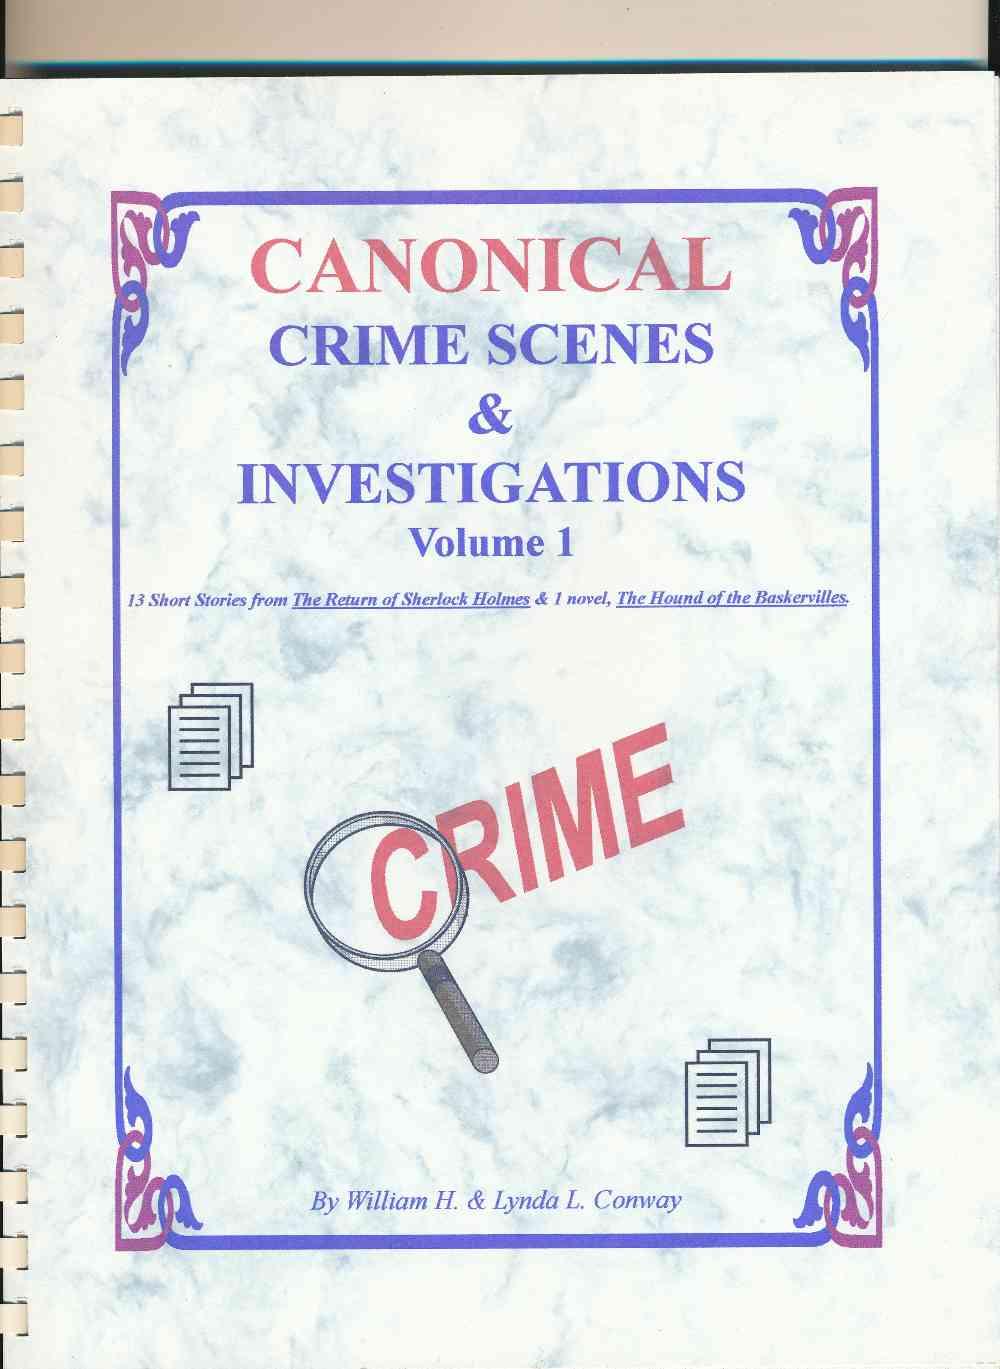 Canonical crime scenes and investigations. Volume 1